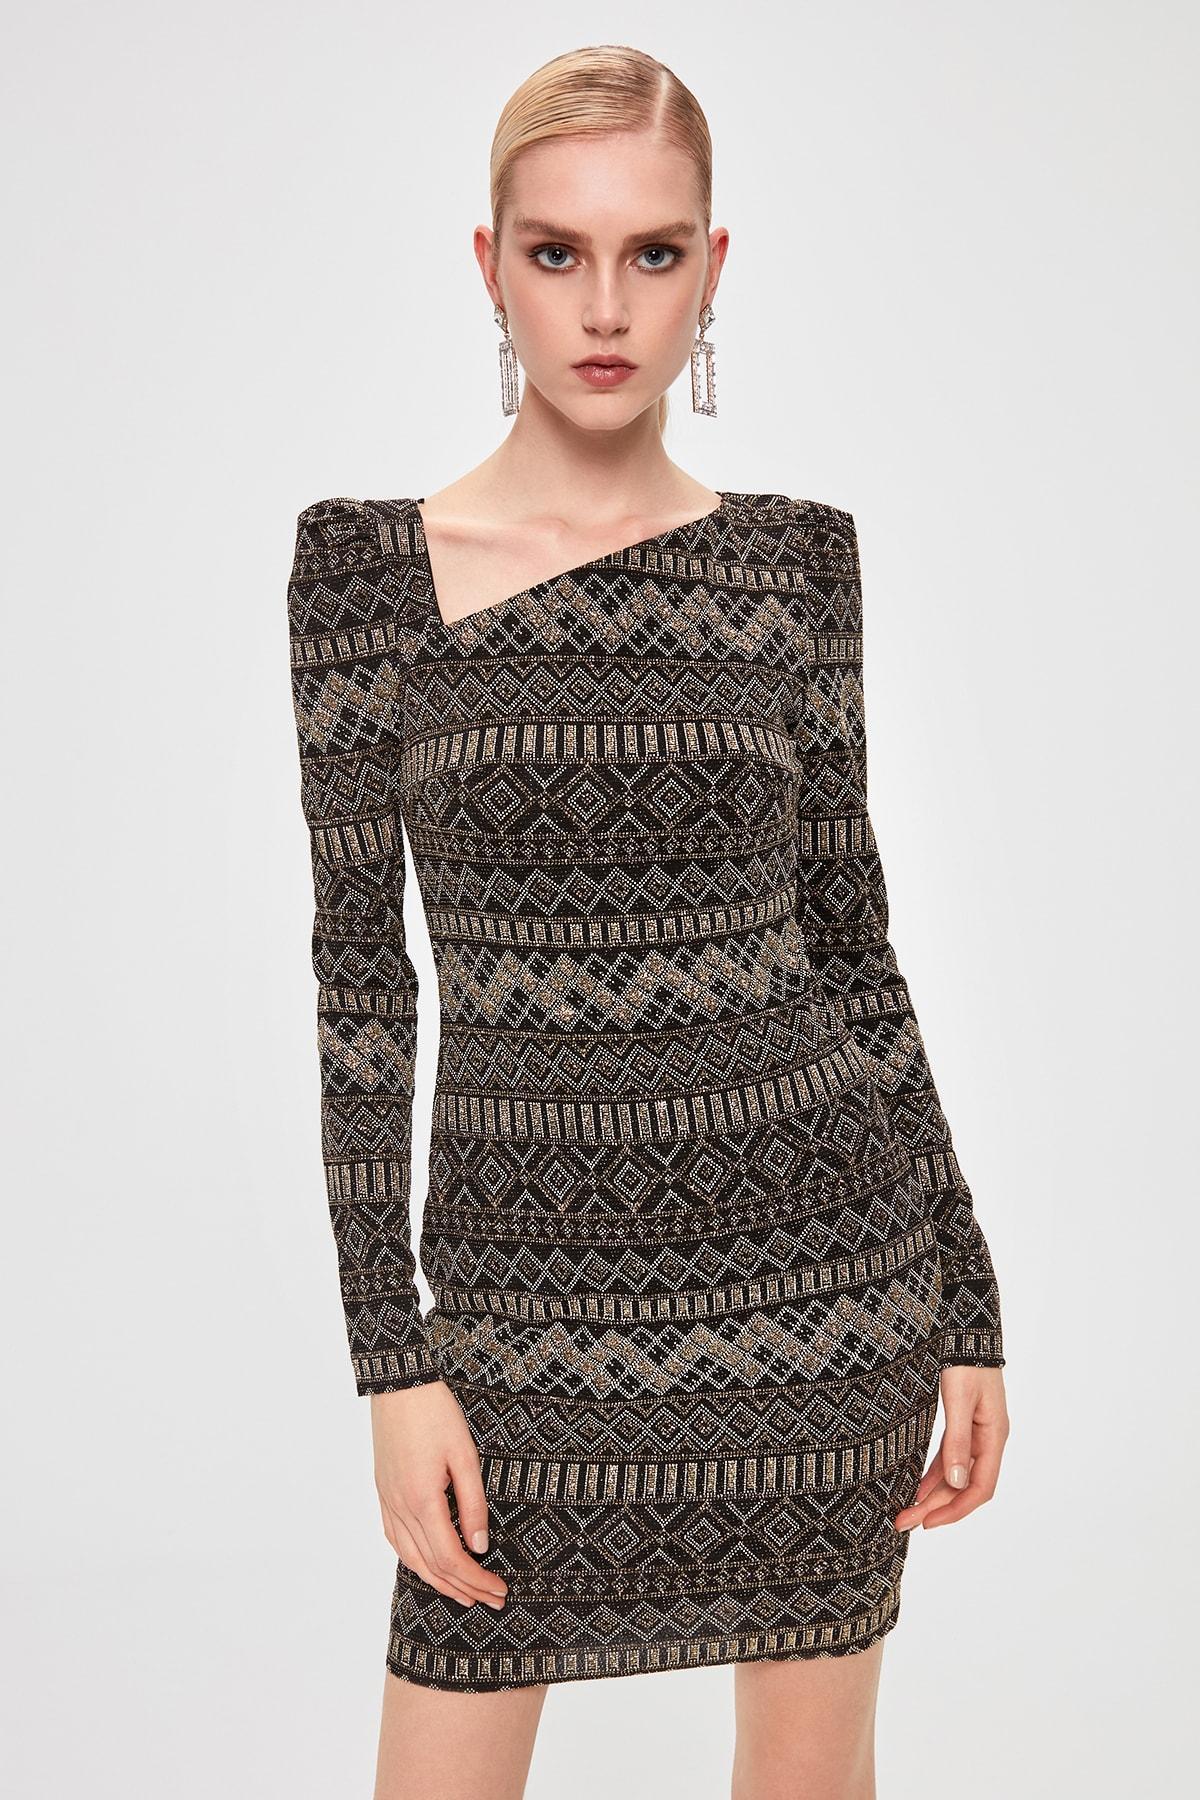 Trendyol Collar Low-Cut Dress TPRAW20EL1594()